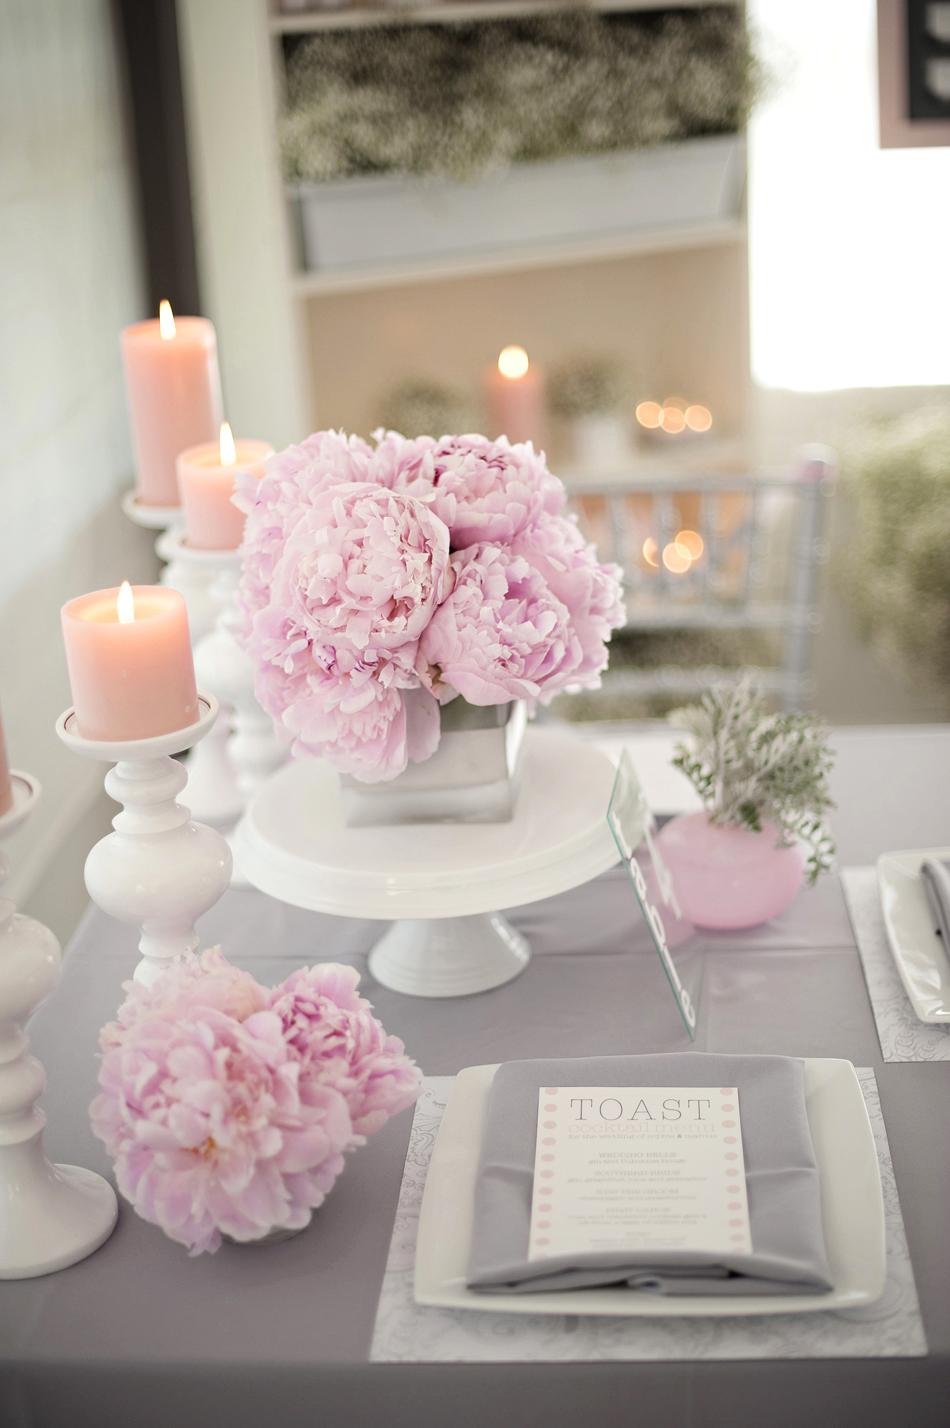 http://wonderfulweddingthemes.blogspot.fi/2013/01/pink-and-grey-wedding.html